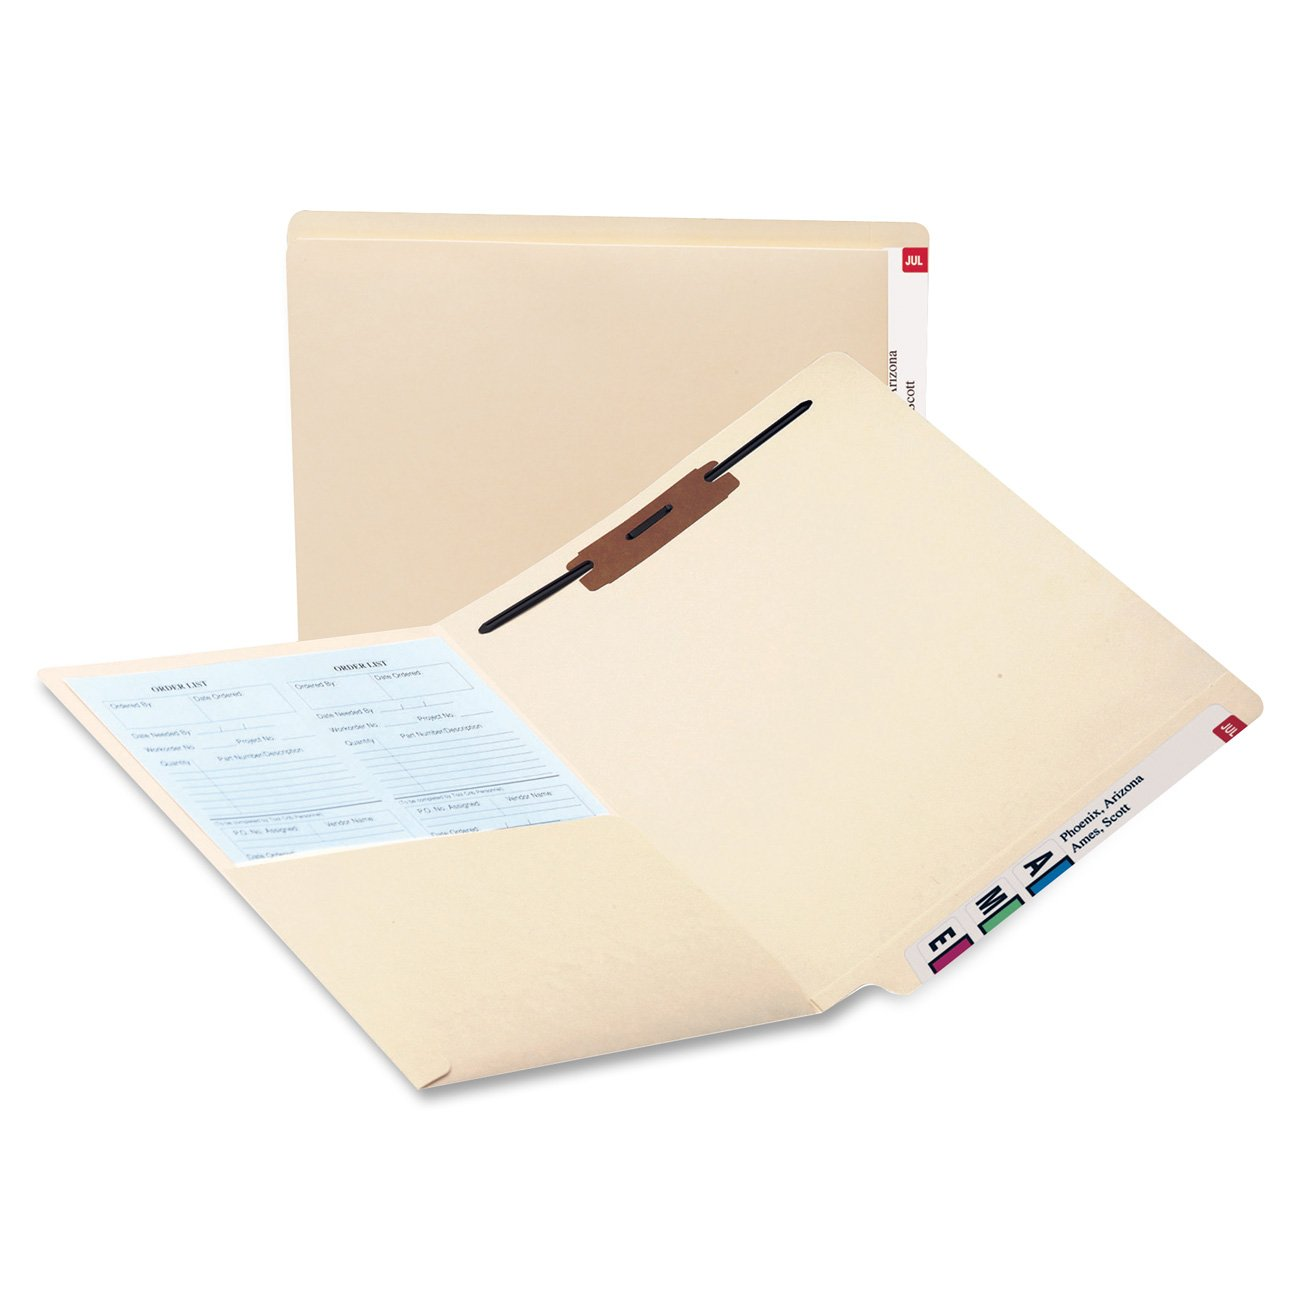 Smead 34100 Reinforced End Tab Pocket Folder, Fastener, Straight Cut, Letter, Manila (Box of 50)